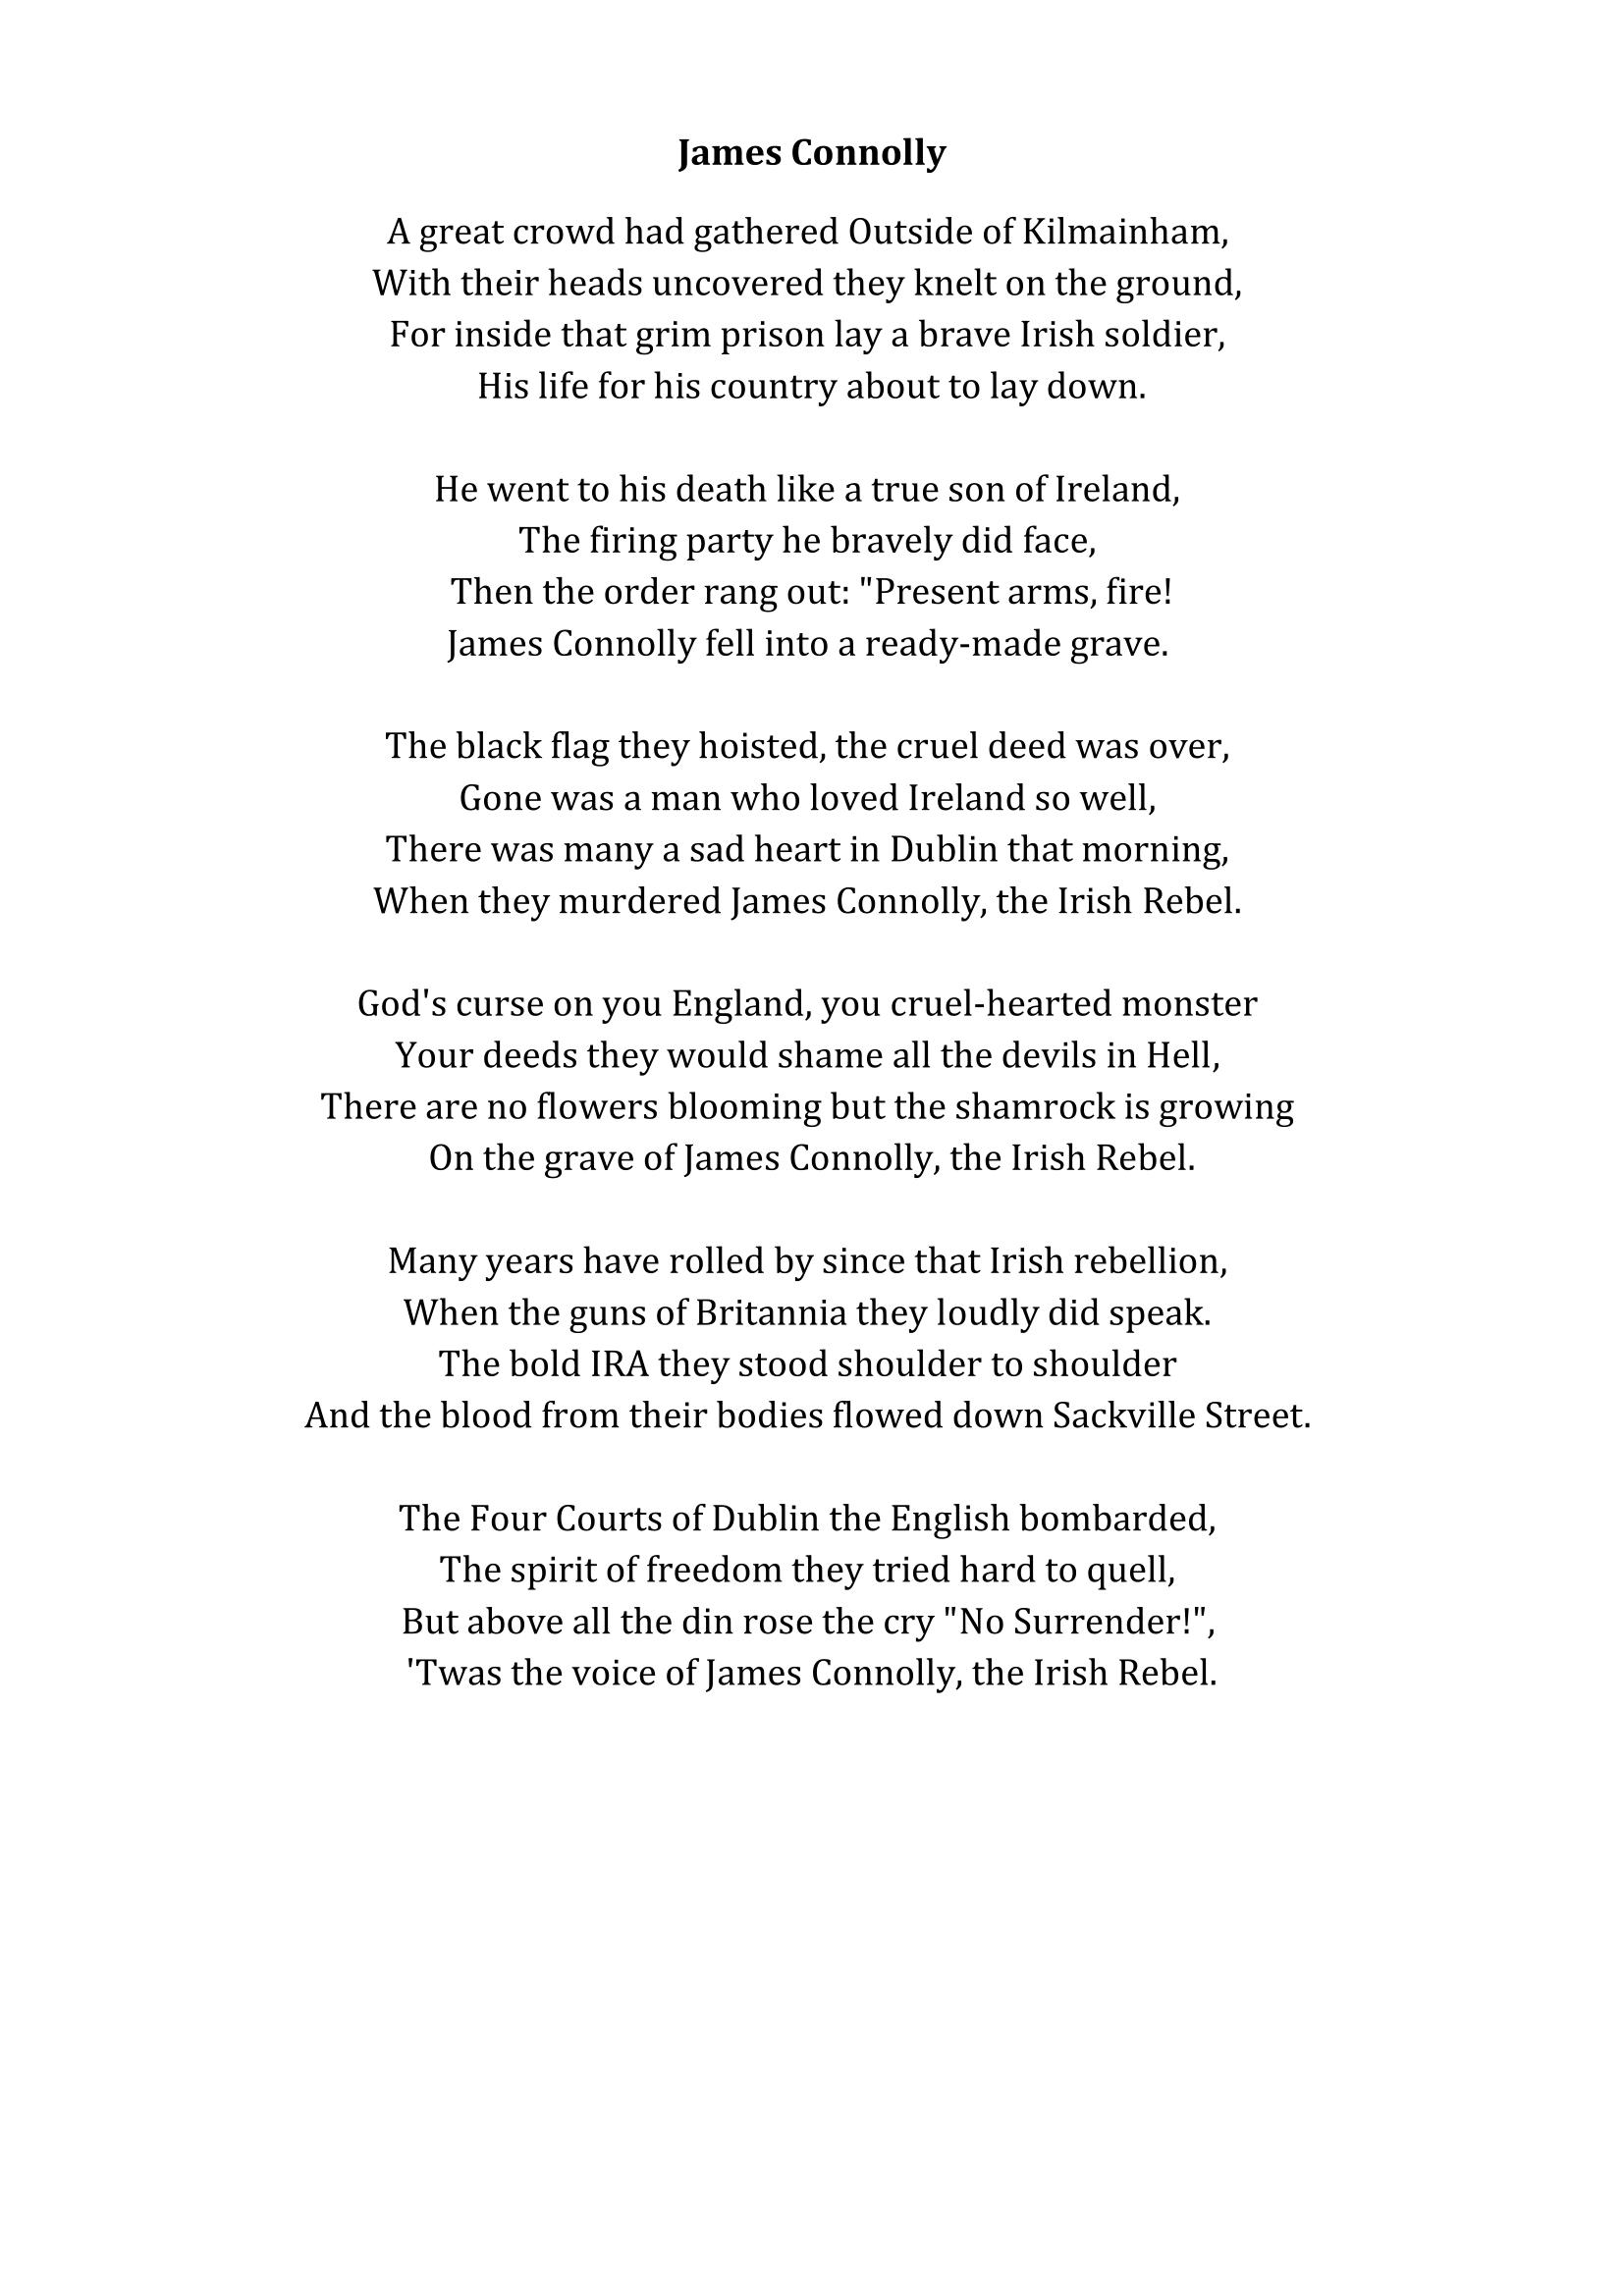 james-connolly-lyrics-1